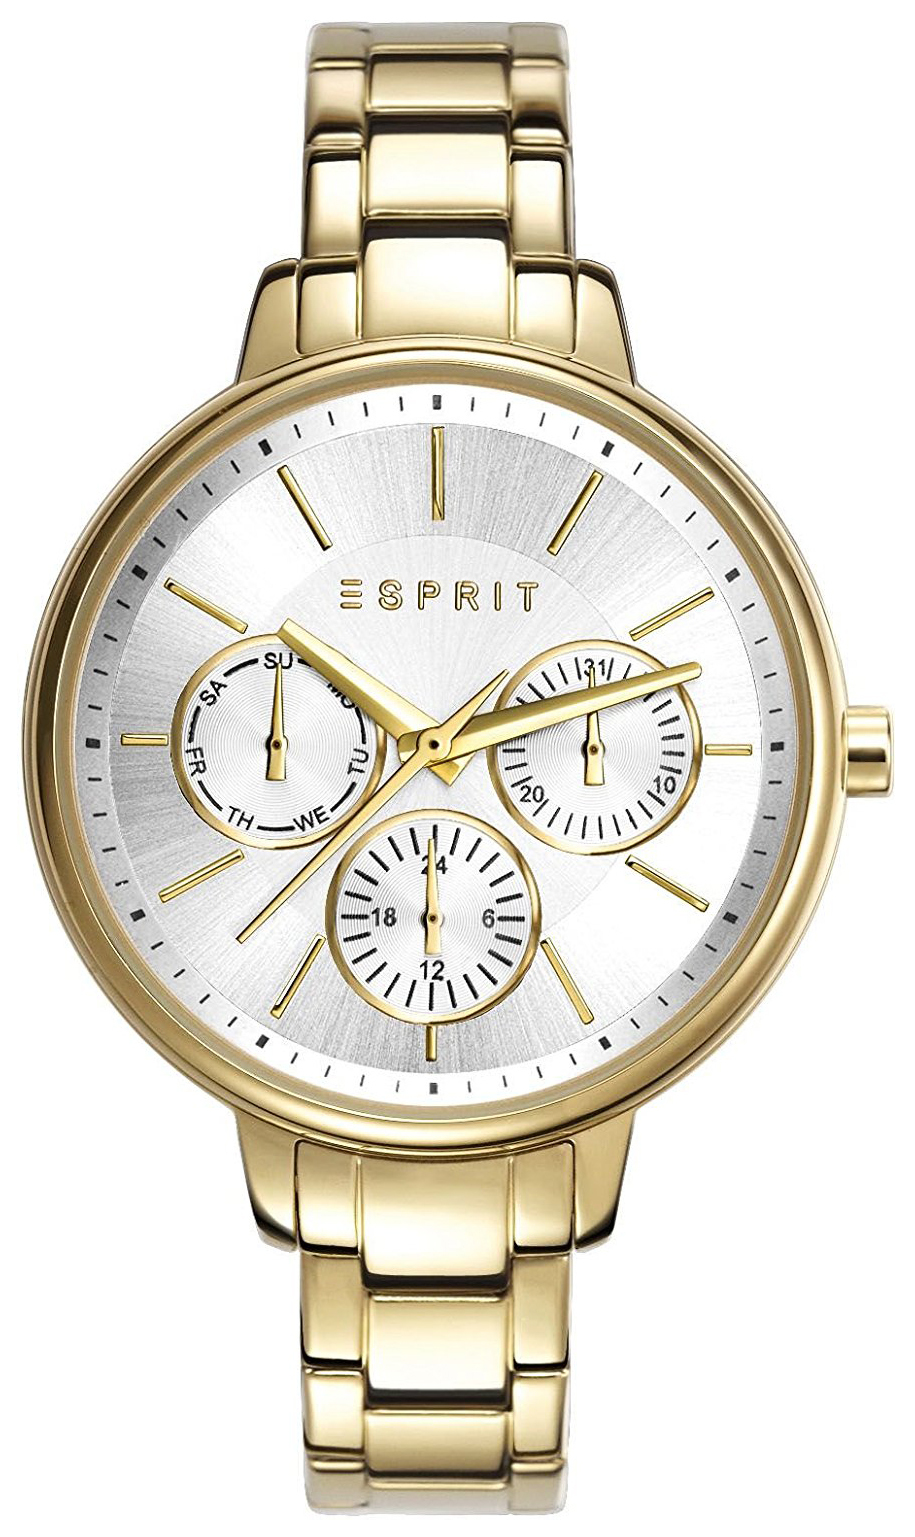 Esprit 99999 Dameklokke ES108152006 Sølvfarget/Gulltonet stål Ø36 - Esprit